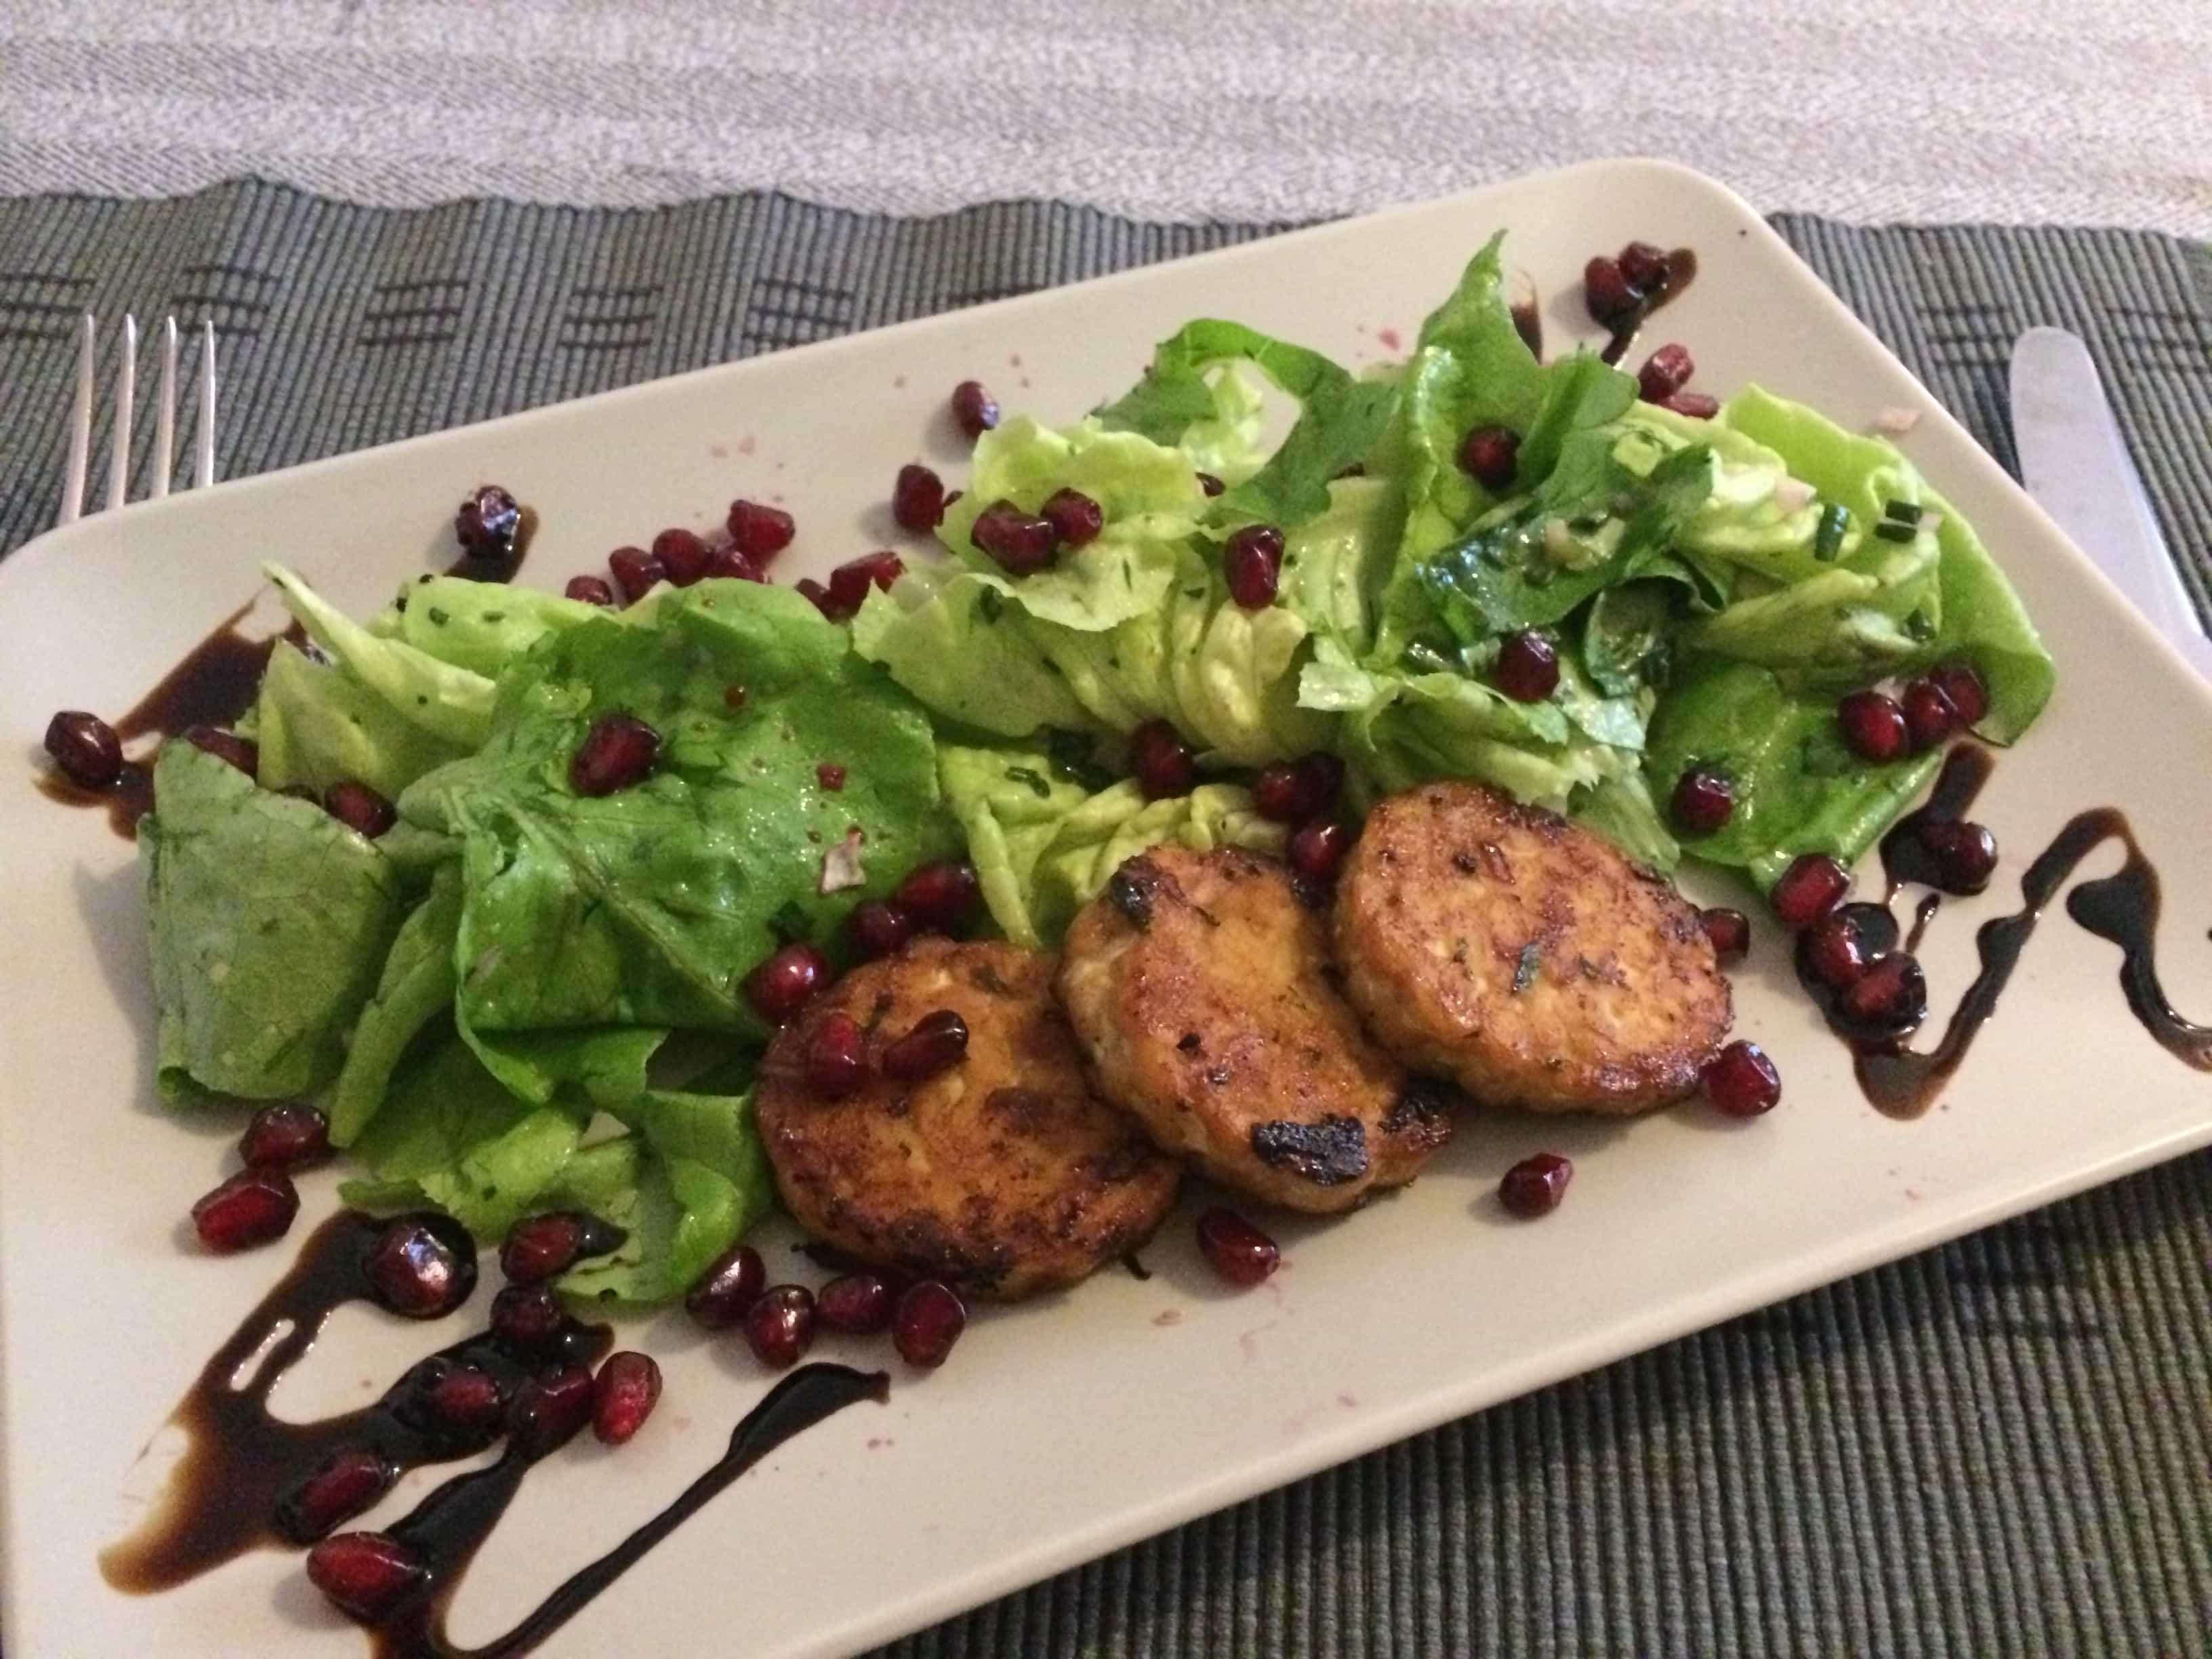 Salatteller mit marinierten Tempeh-Talern, Granatapfelkernen und Walnuss-Kräuter-Vinaigrette